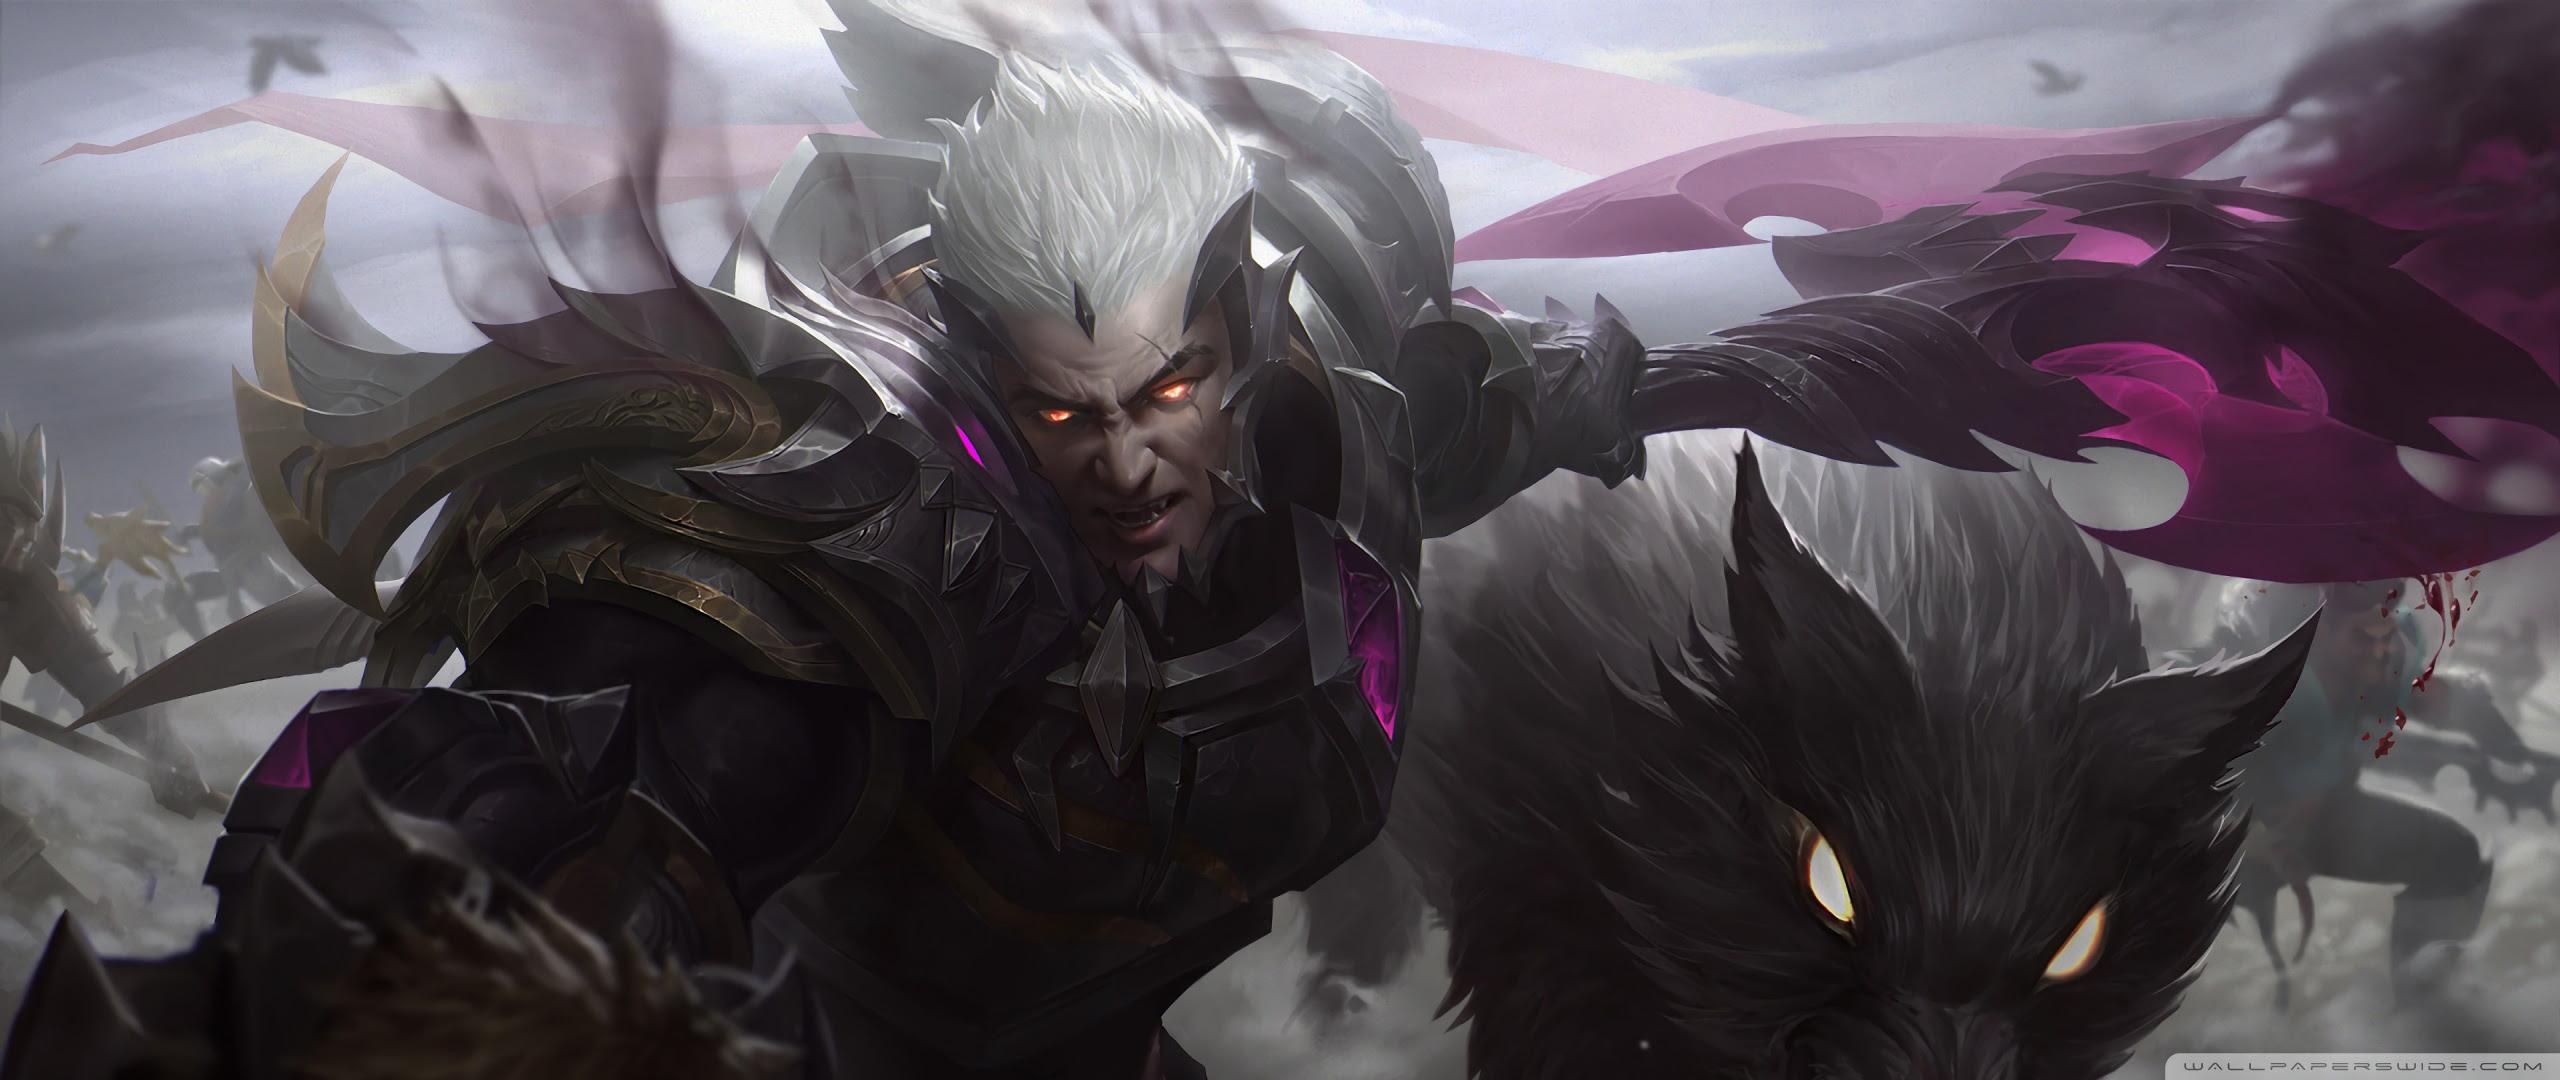 God King Darius League Of Legends Lol Uhd Desktop Wallpaper